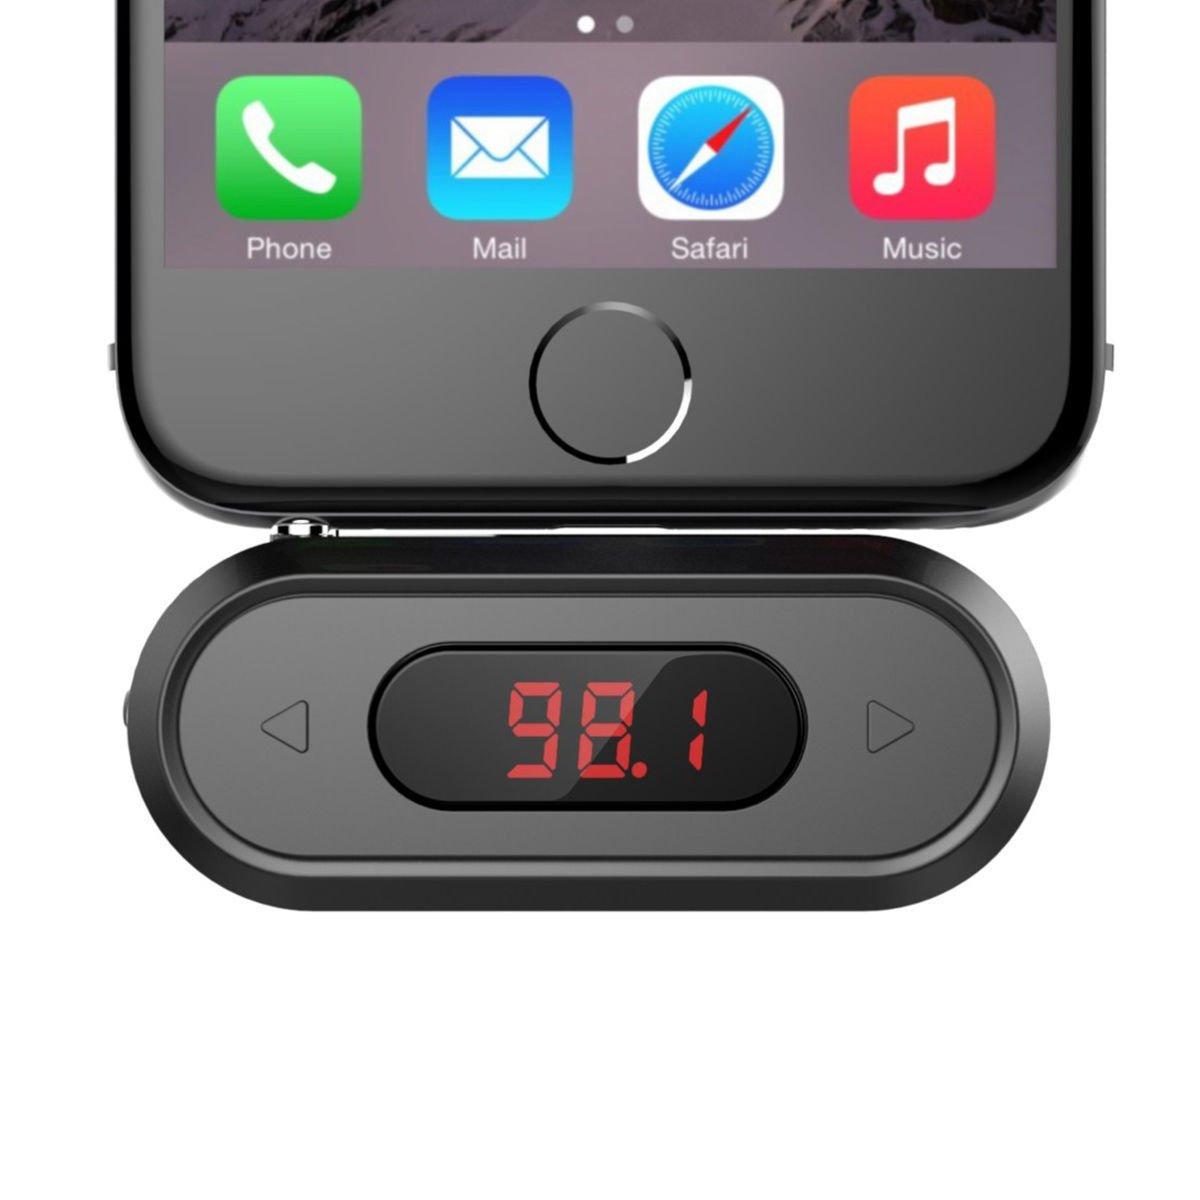 REALMAX/® Coche Wireless MP3/Music Radio FM transmisor de Manos Libres Universal para Compatible con Todo Tipo de m/óviles iPhone iPod Samsung HTC Sony Nokia LG Blackberry